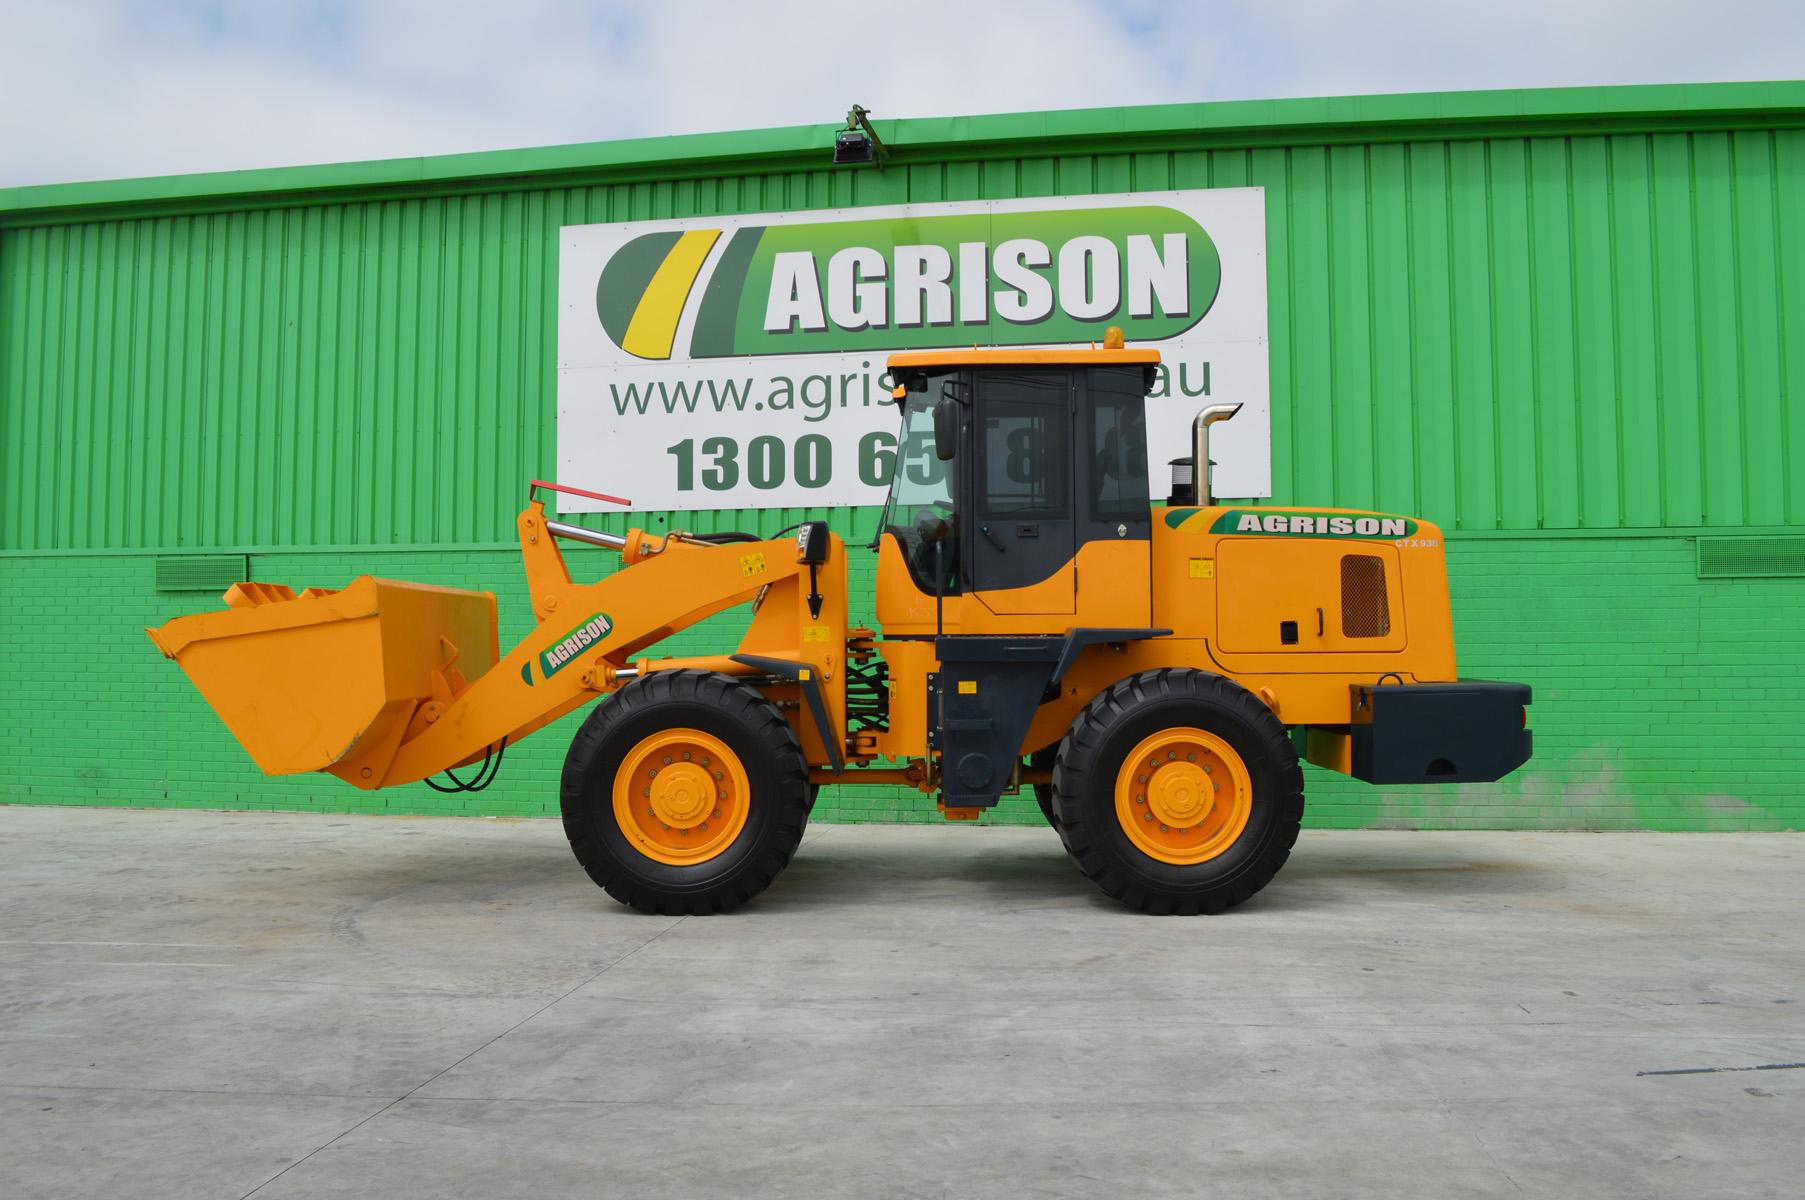 macchine agricole agrison australia Agrison-TX936-Wheel-Loader-9